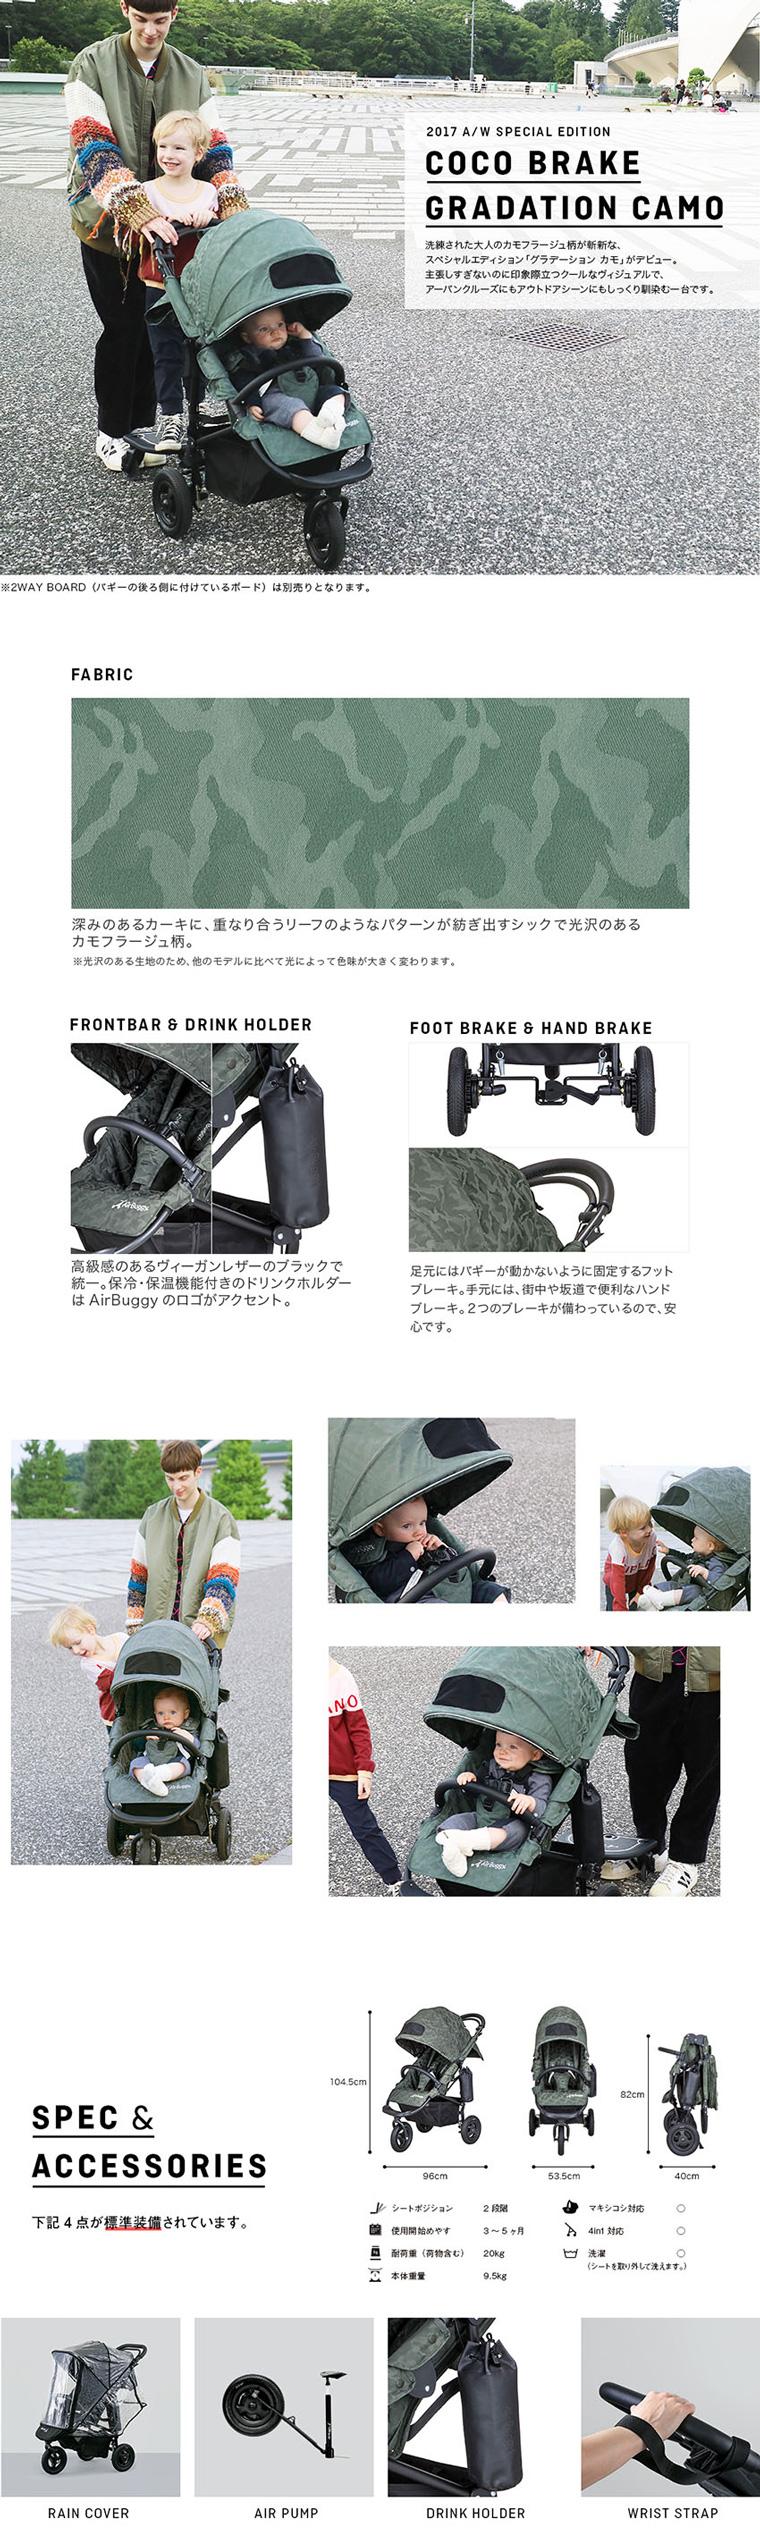 airbuggy-coco-brake-ex-GRADATION-CAMO-info01